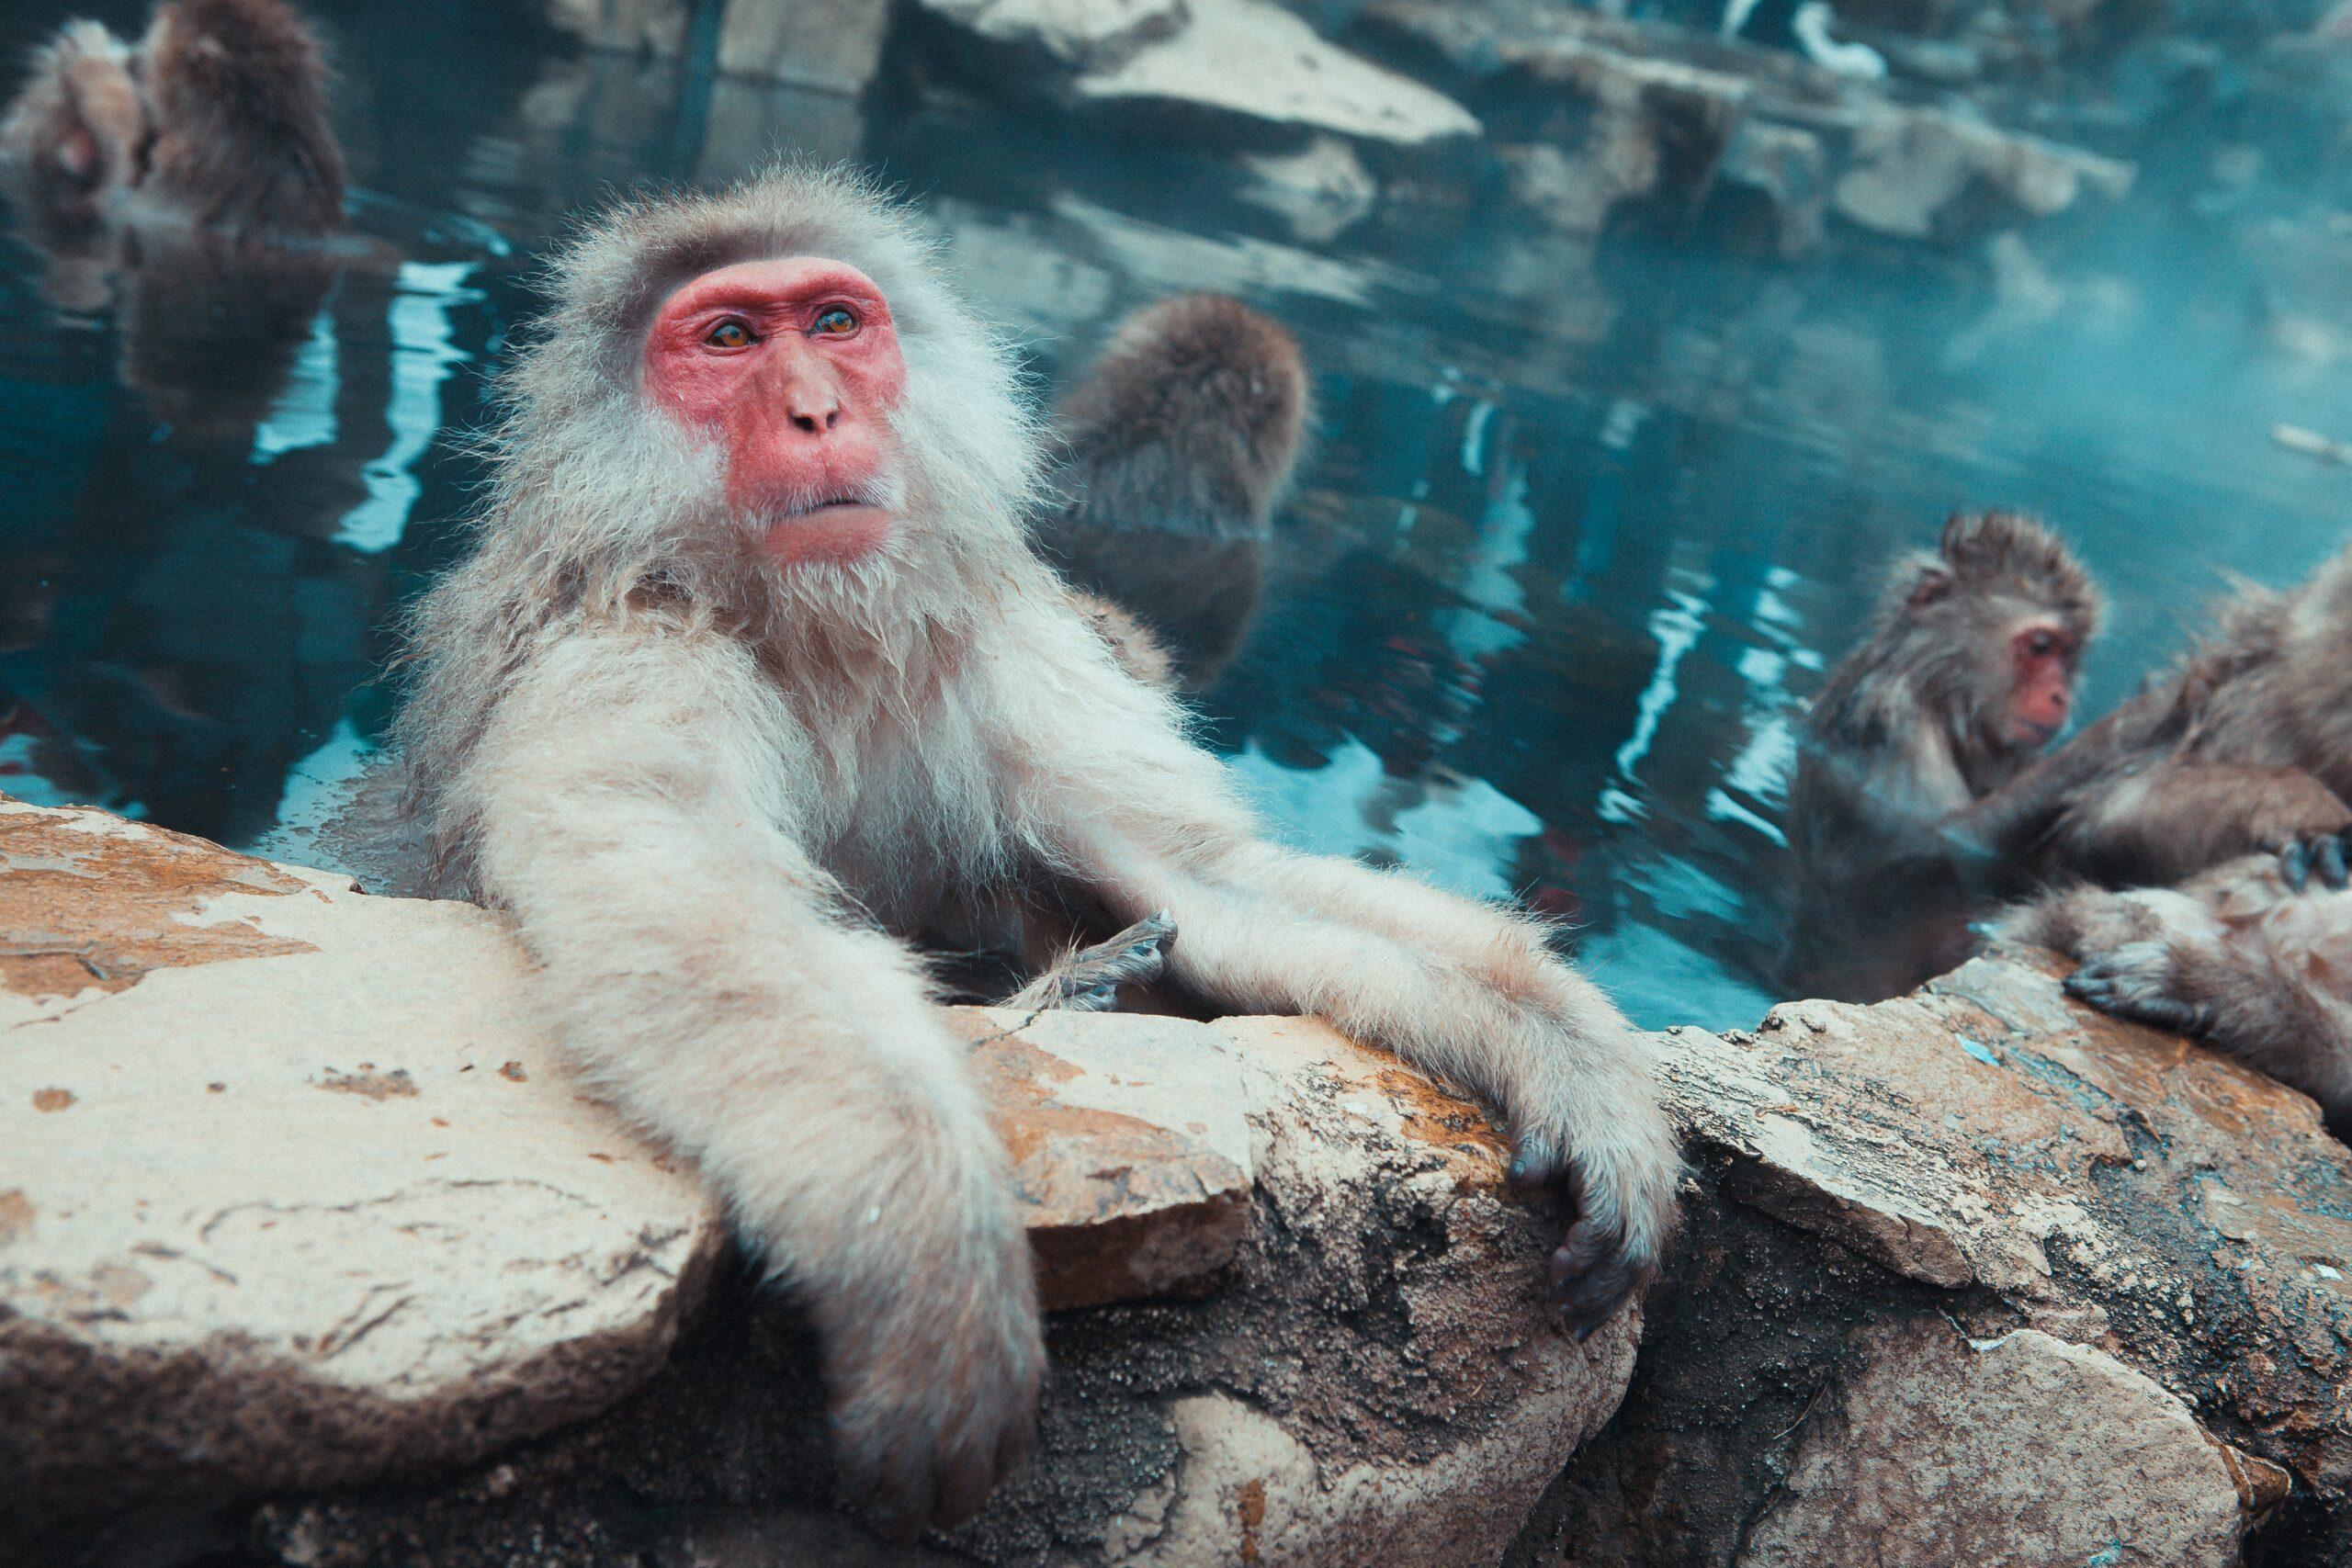 jonathan-forage-Monkey holding on with both hands around log-unsplash